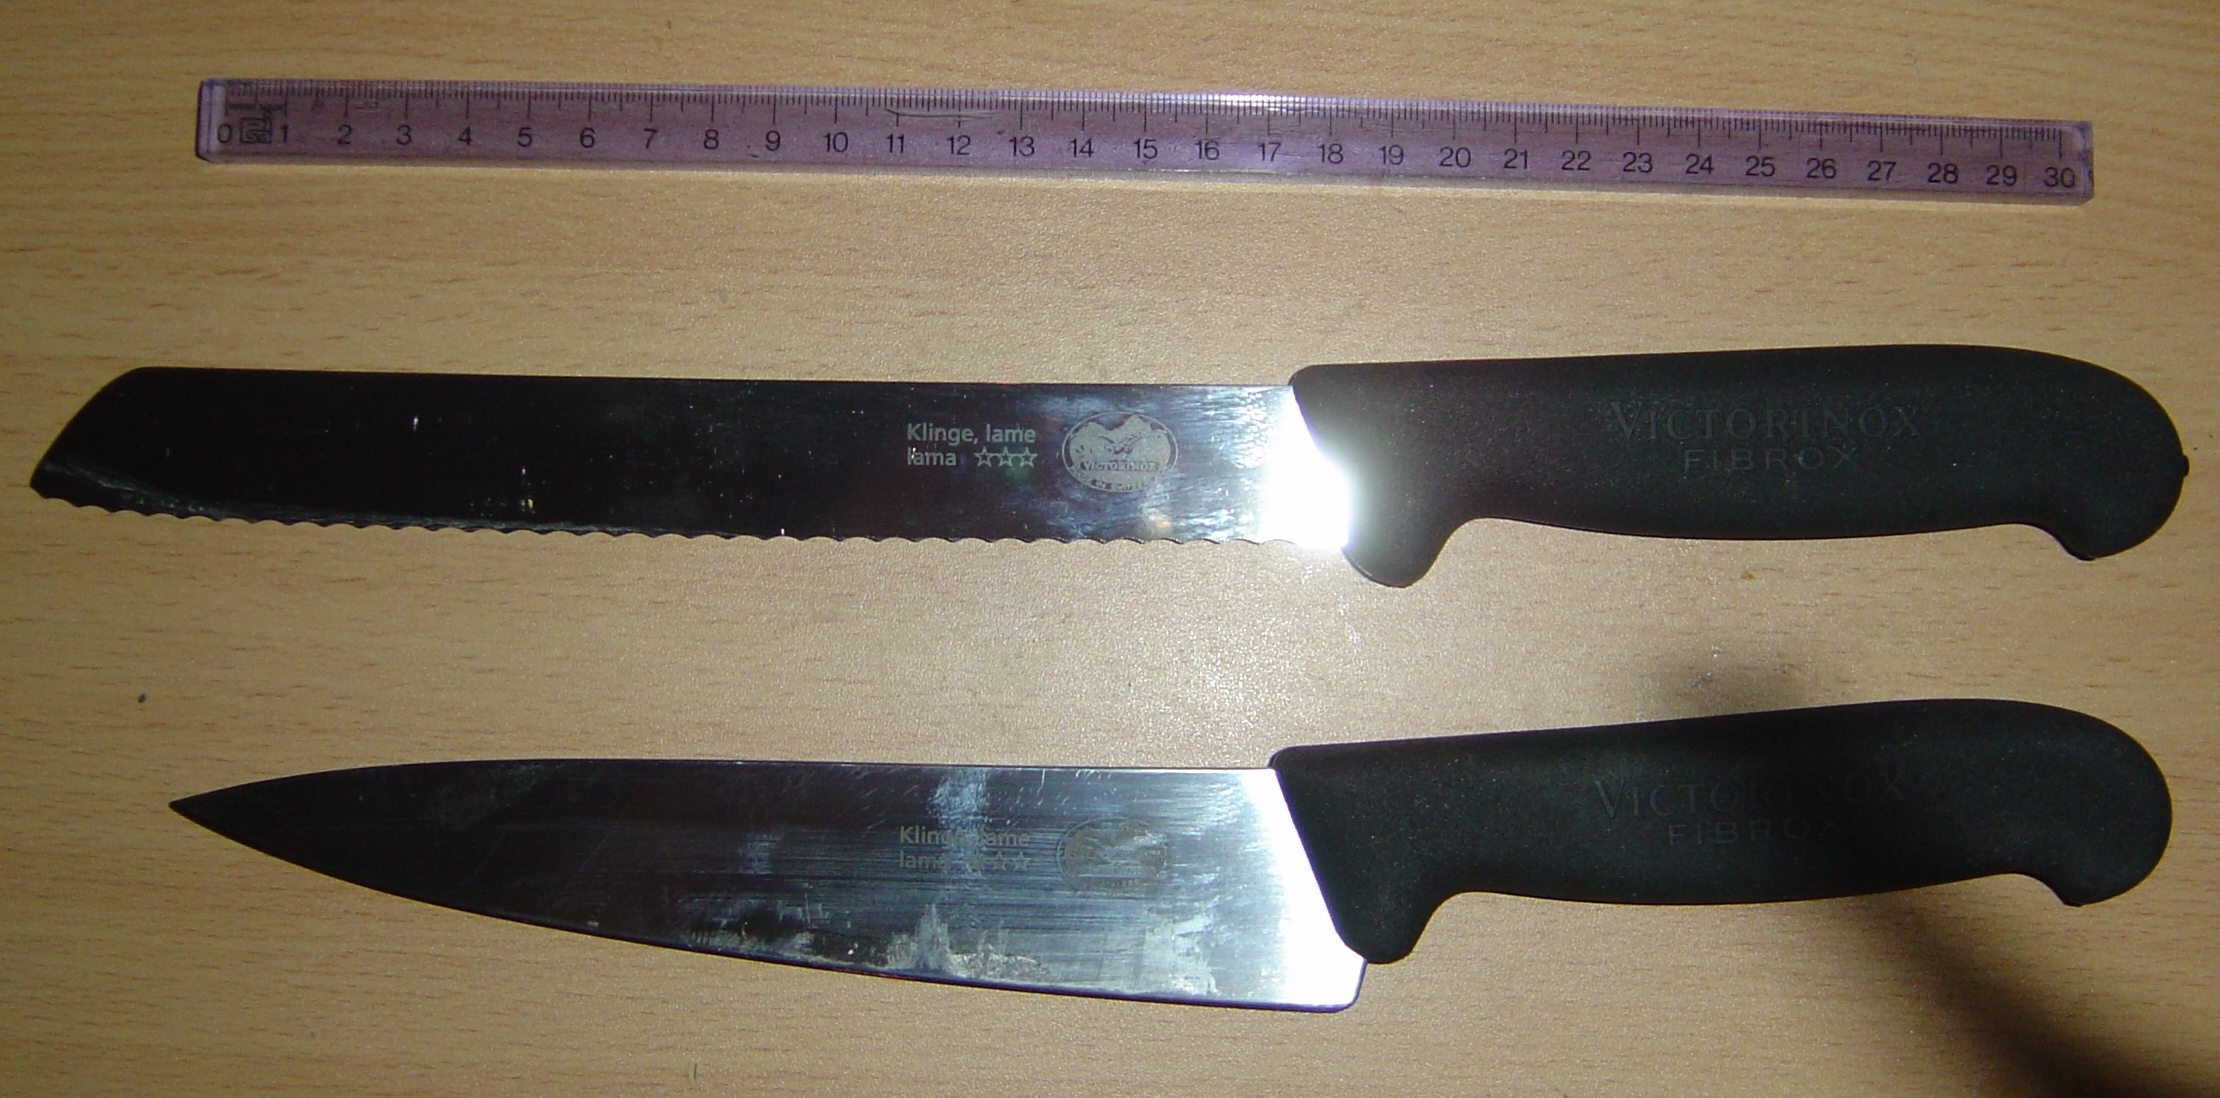 Filevictorinox Bread And Kitchen Knives Jpg